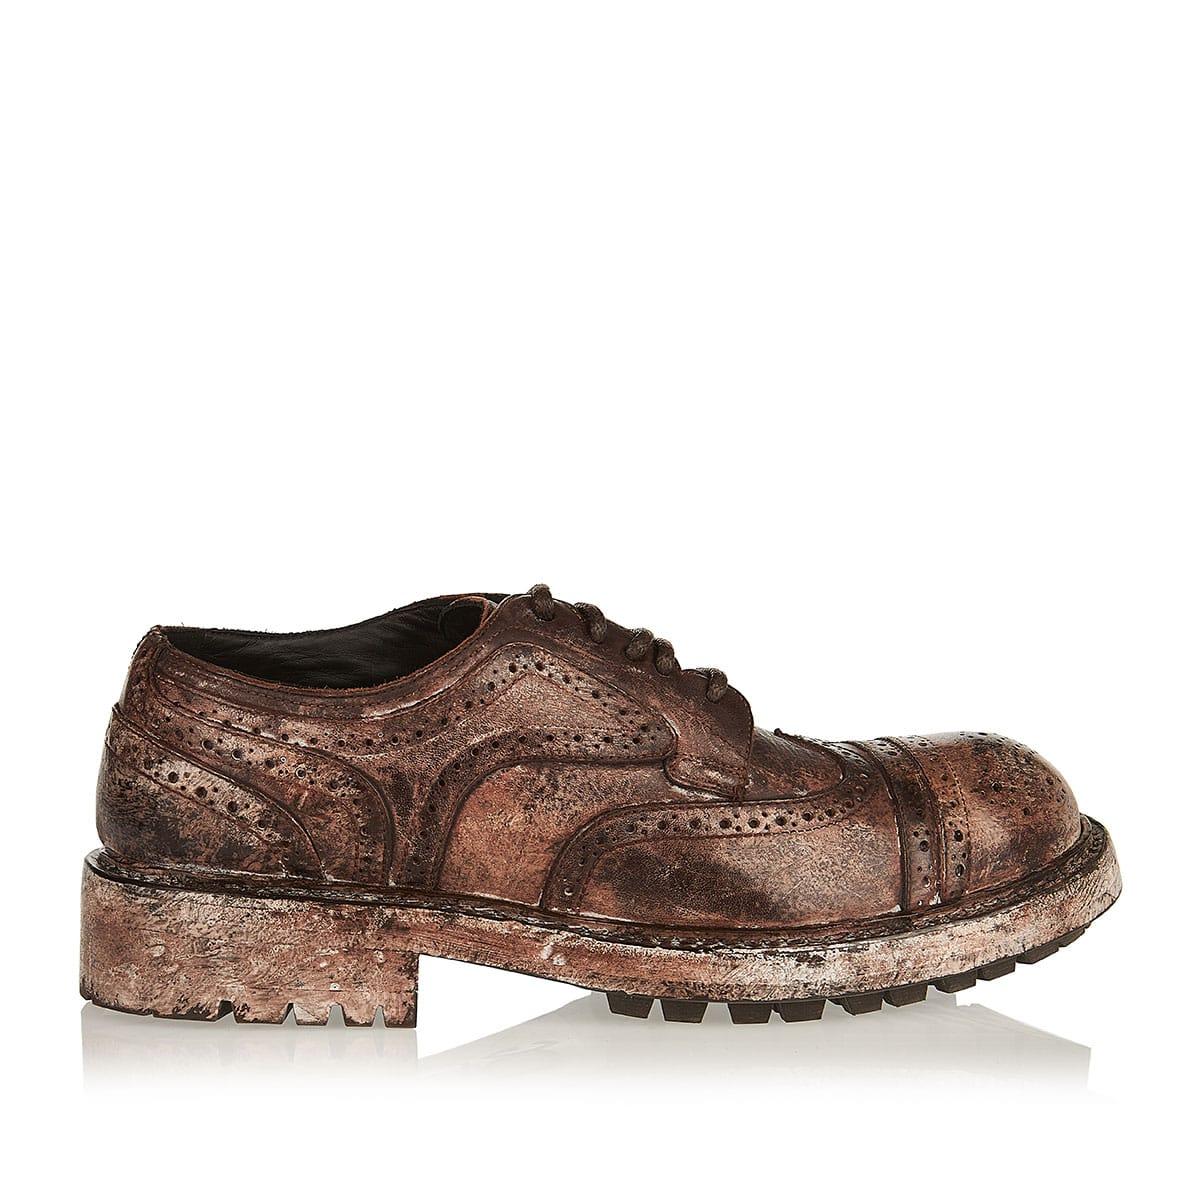 Bernini worn-effect derby shoes